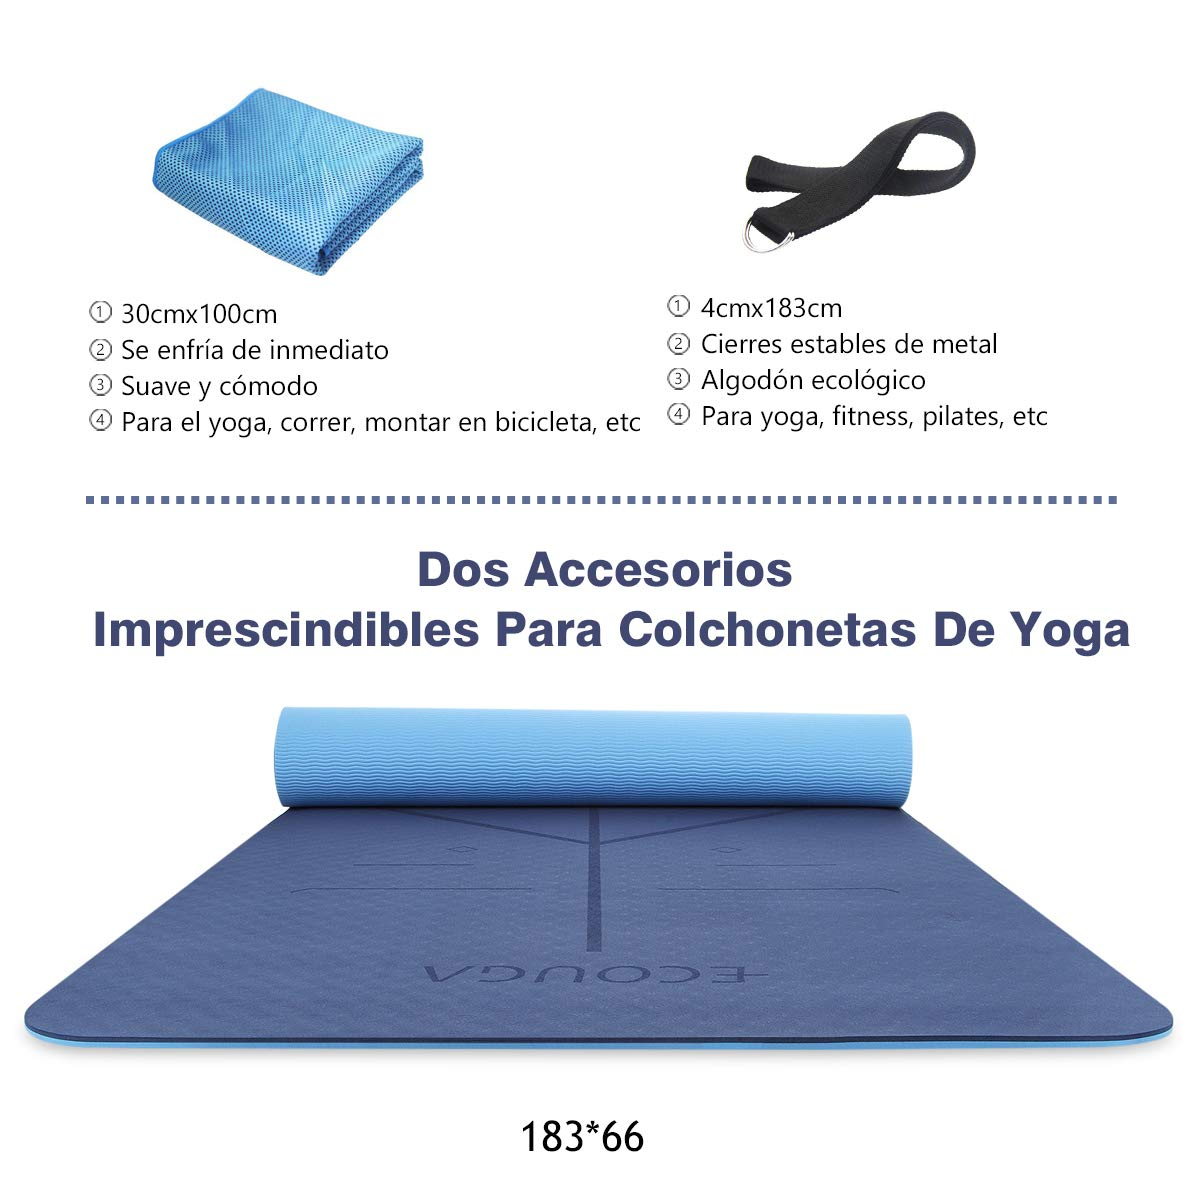 ECOUGA Colchoneta de Yoga Antideslizante con Línea Corporal para Pilates Ejercicio con Banda Tensión Toalla de Hielo Sin PVC Eco Friendly y Duradera ...